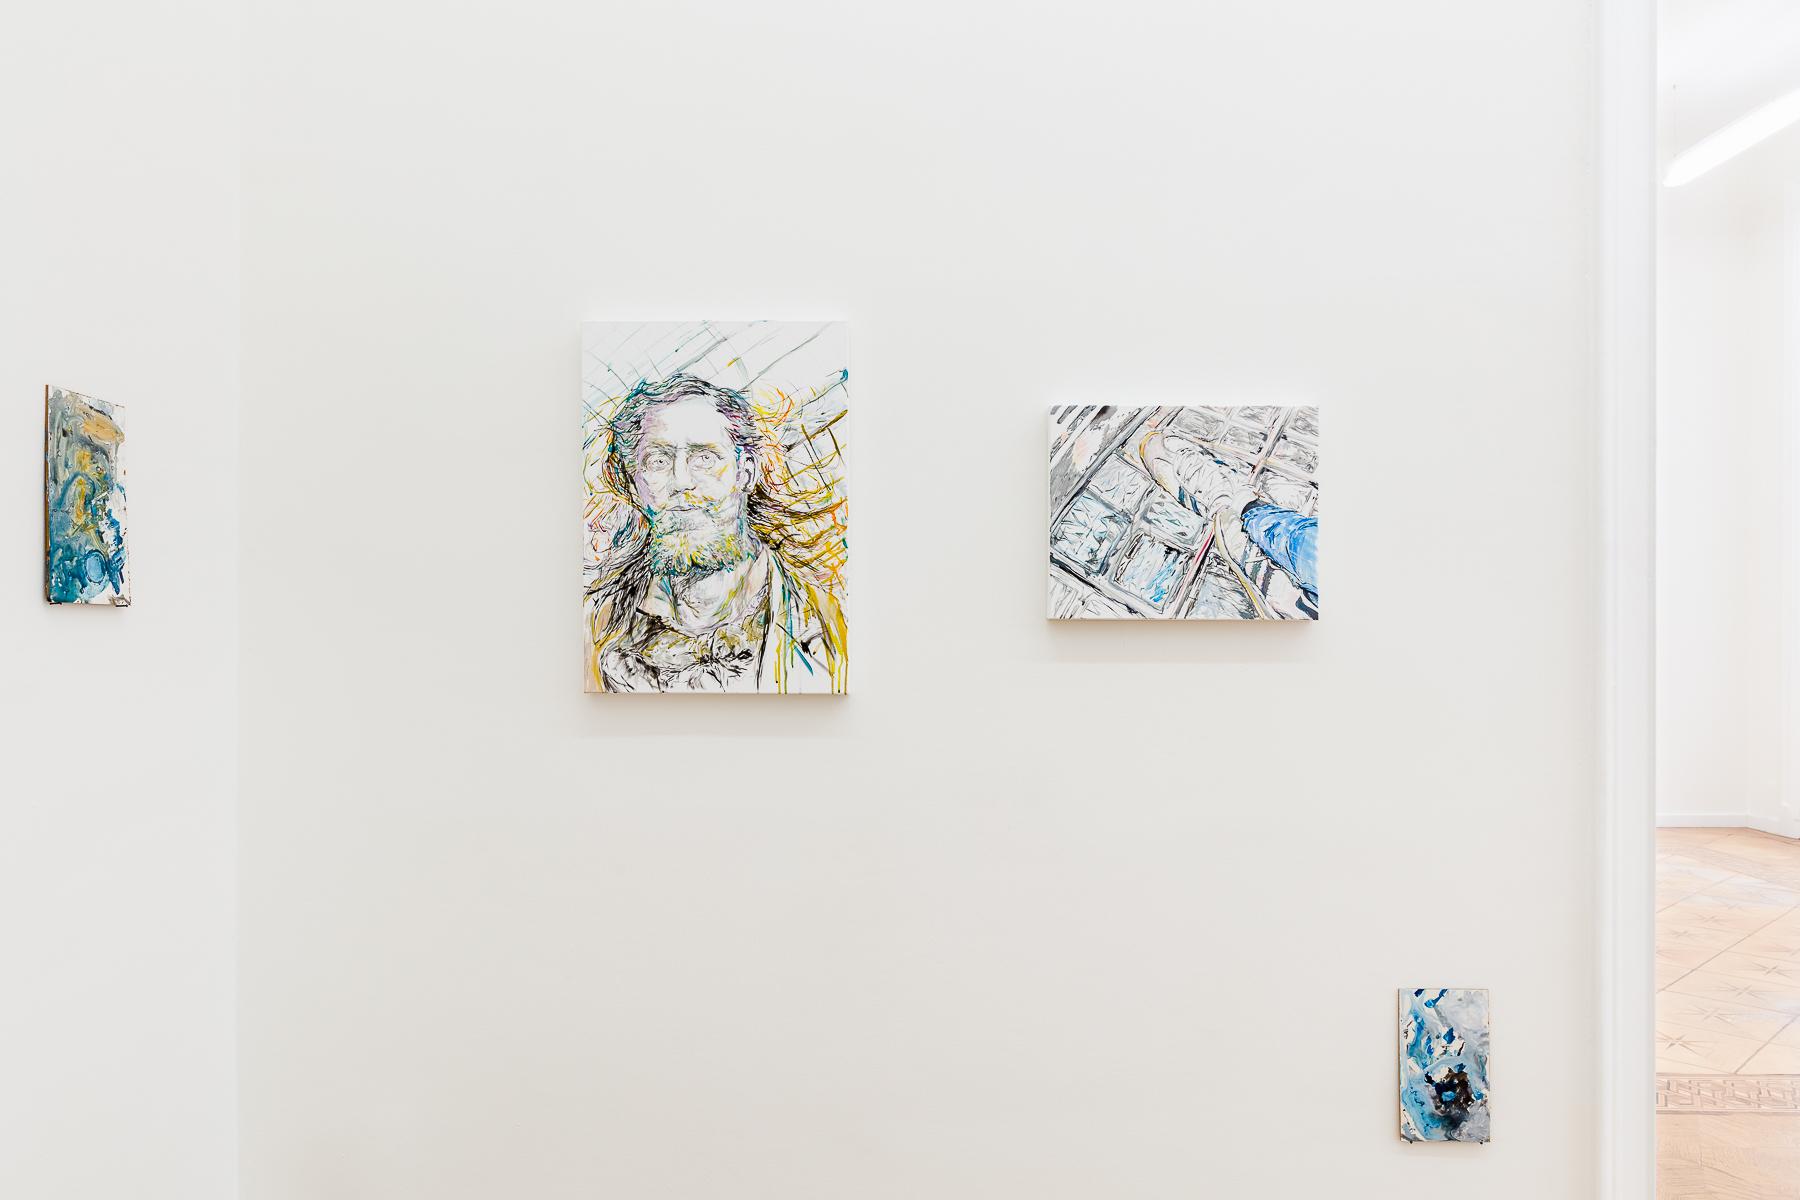 2019_05_20_Elke-Krystufek_Croy-Nielsen_by-kunst-dokumentation-com_046_web.jpg